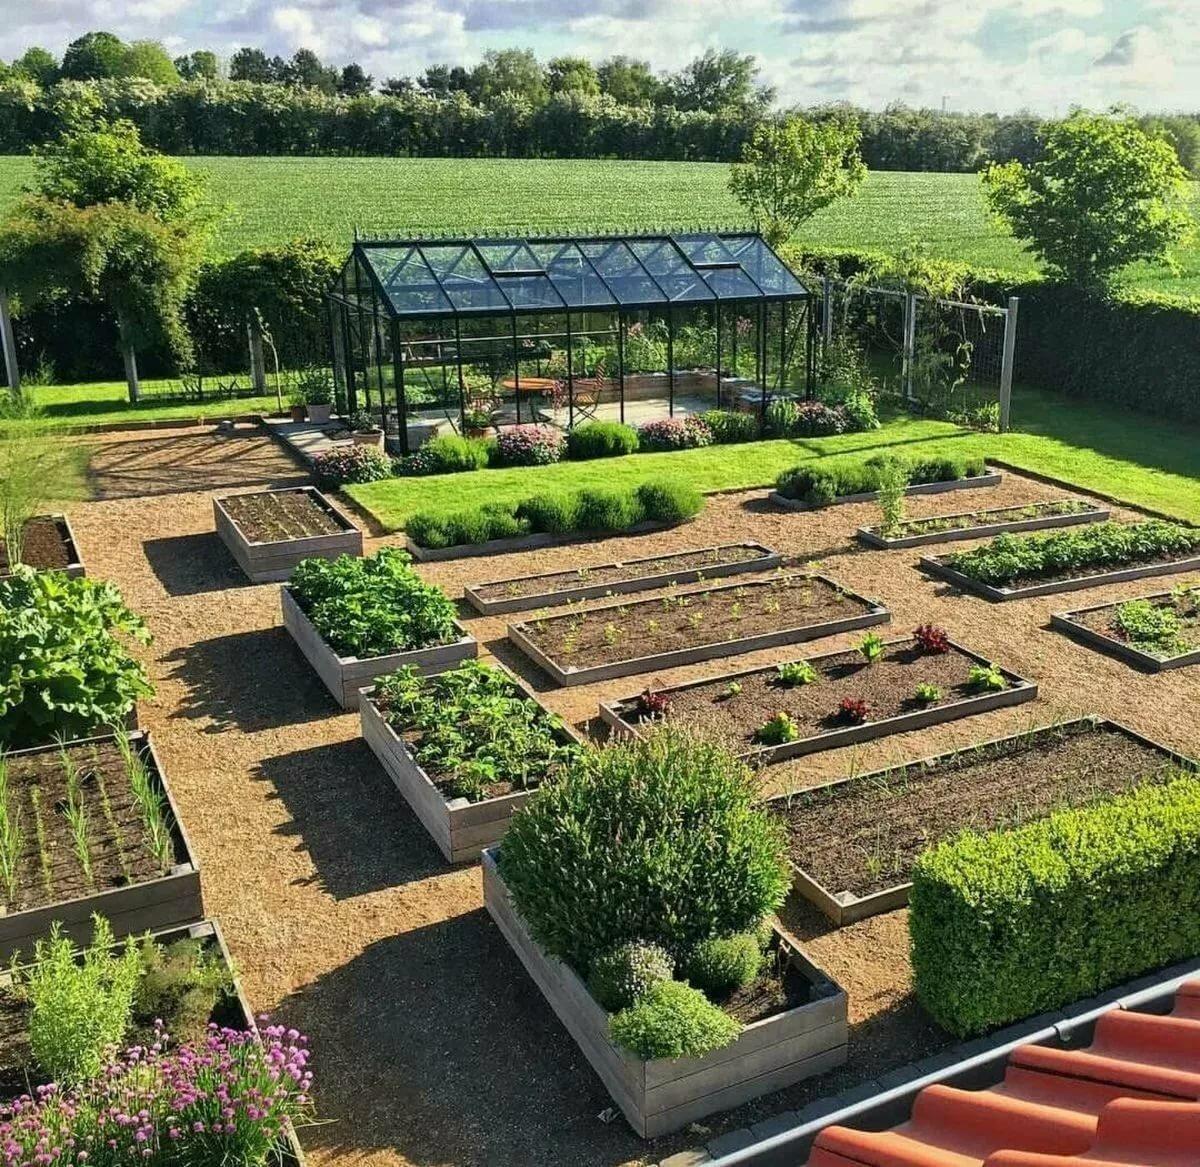 картинка красивого огорода люди абсолютно